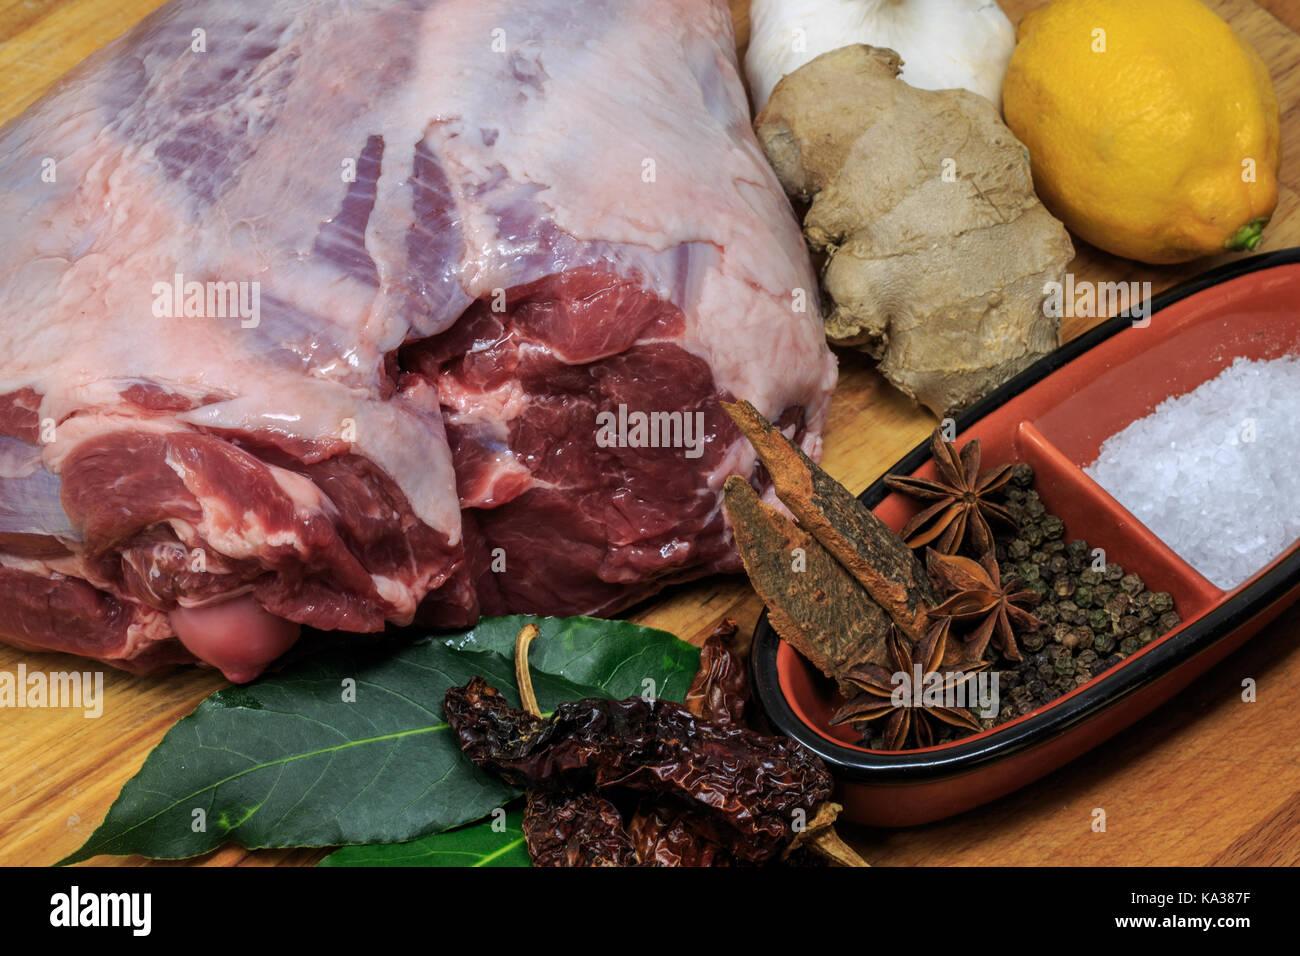 Leg of Lamb for a Sunday Roast - Stock Image